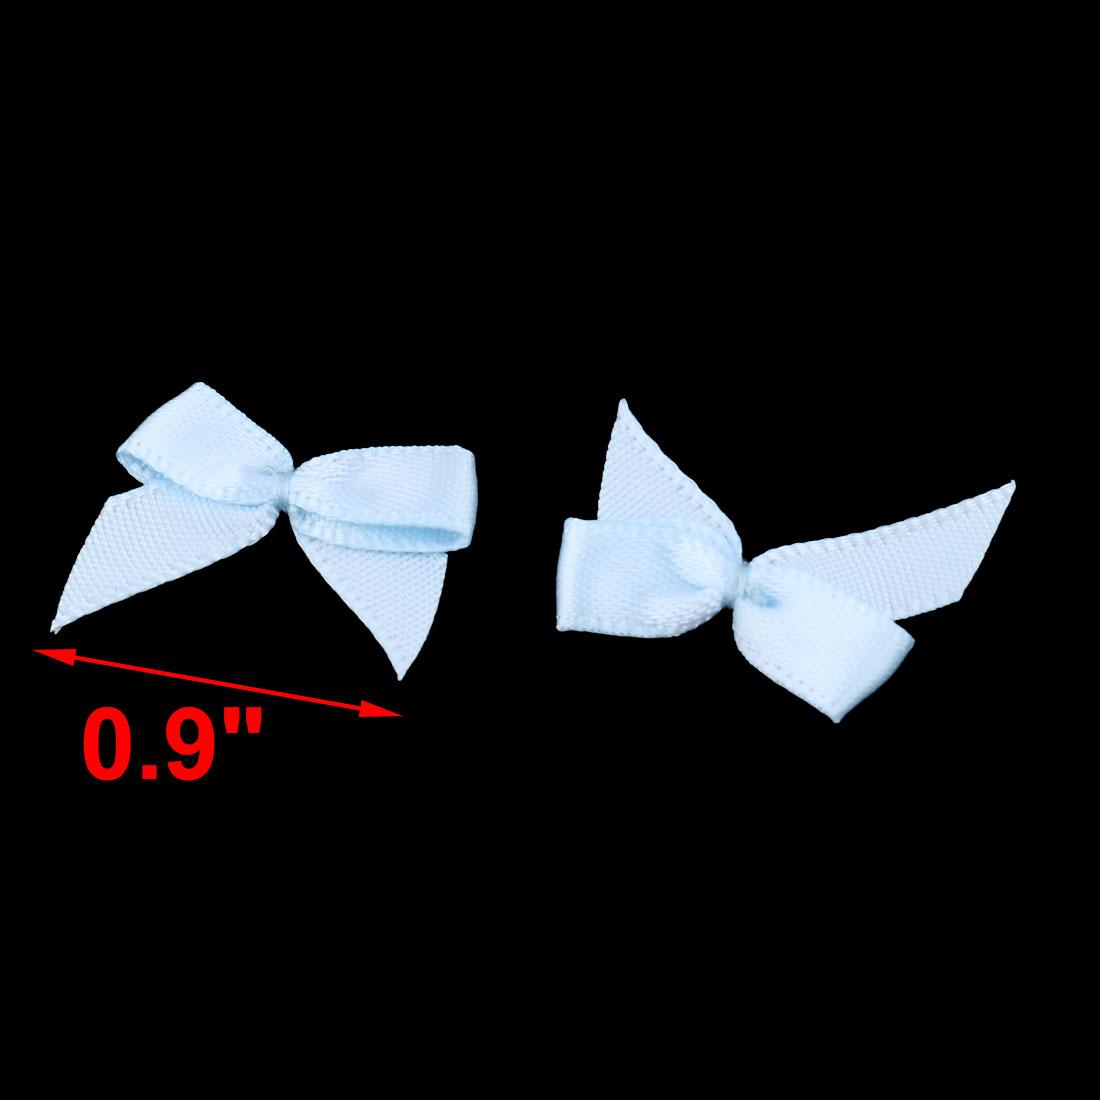 Home Polyester DIY Handcraft Clothing Shirt Scarf Bowknot Bow Light Blue 100 Pcs - image 2 de 3